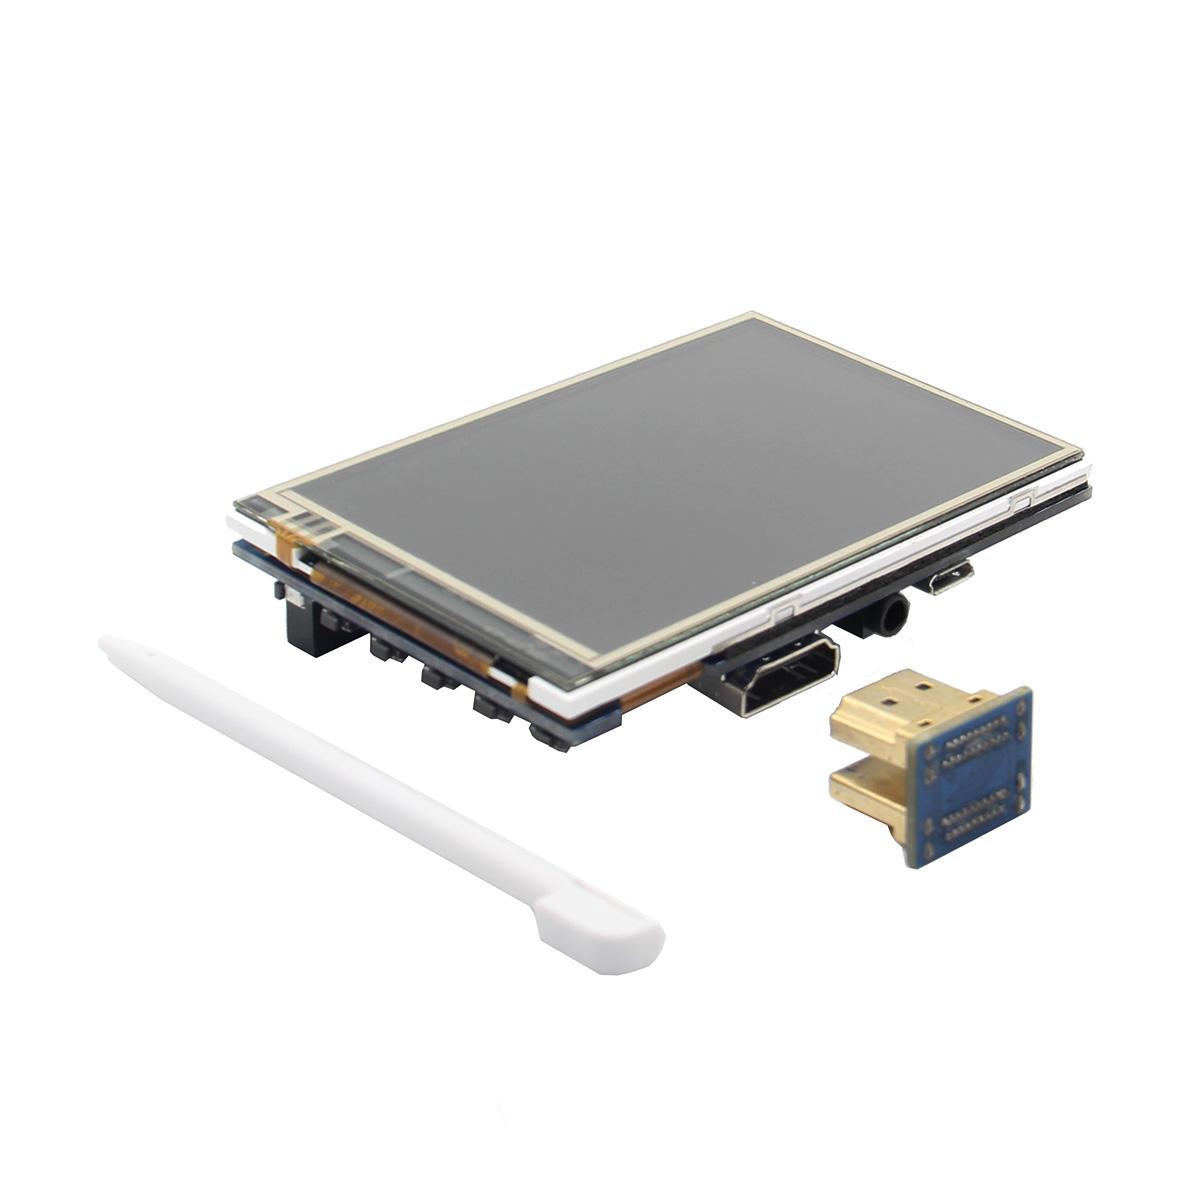 3.5 Inch 480x320@60Fps HD LCD Touch Screen For Raspberry Pi 3 Model B / 2B / Zero